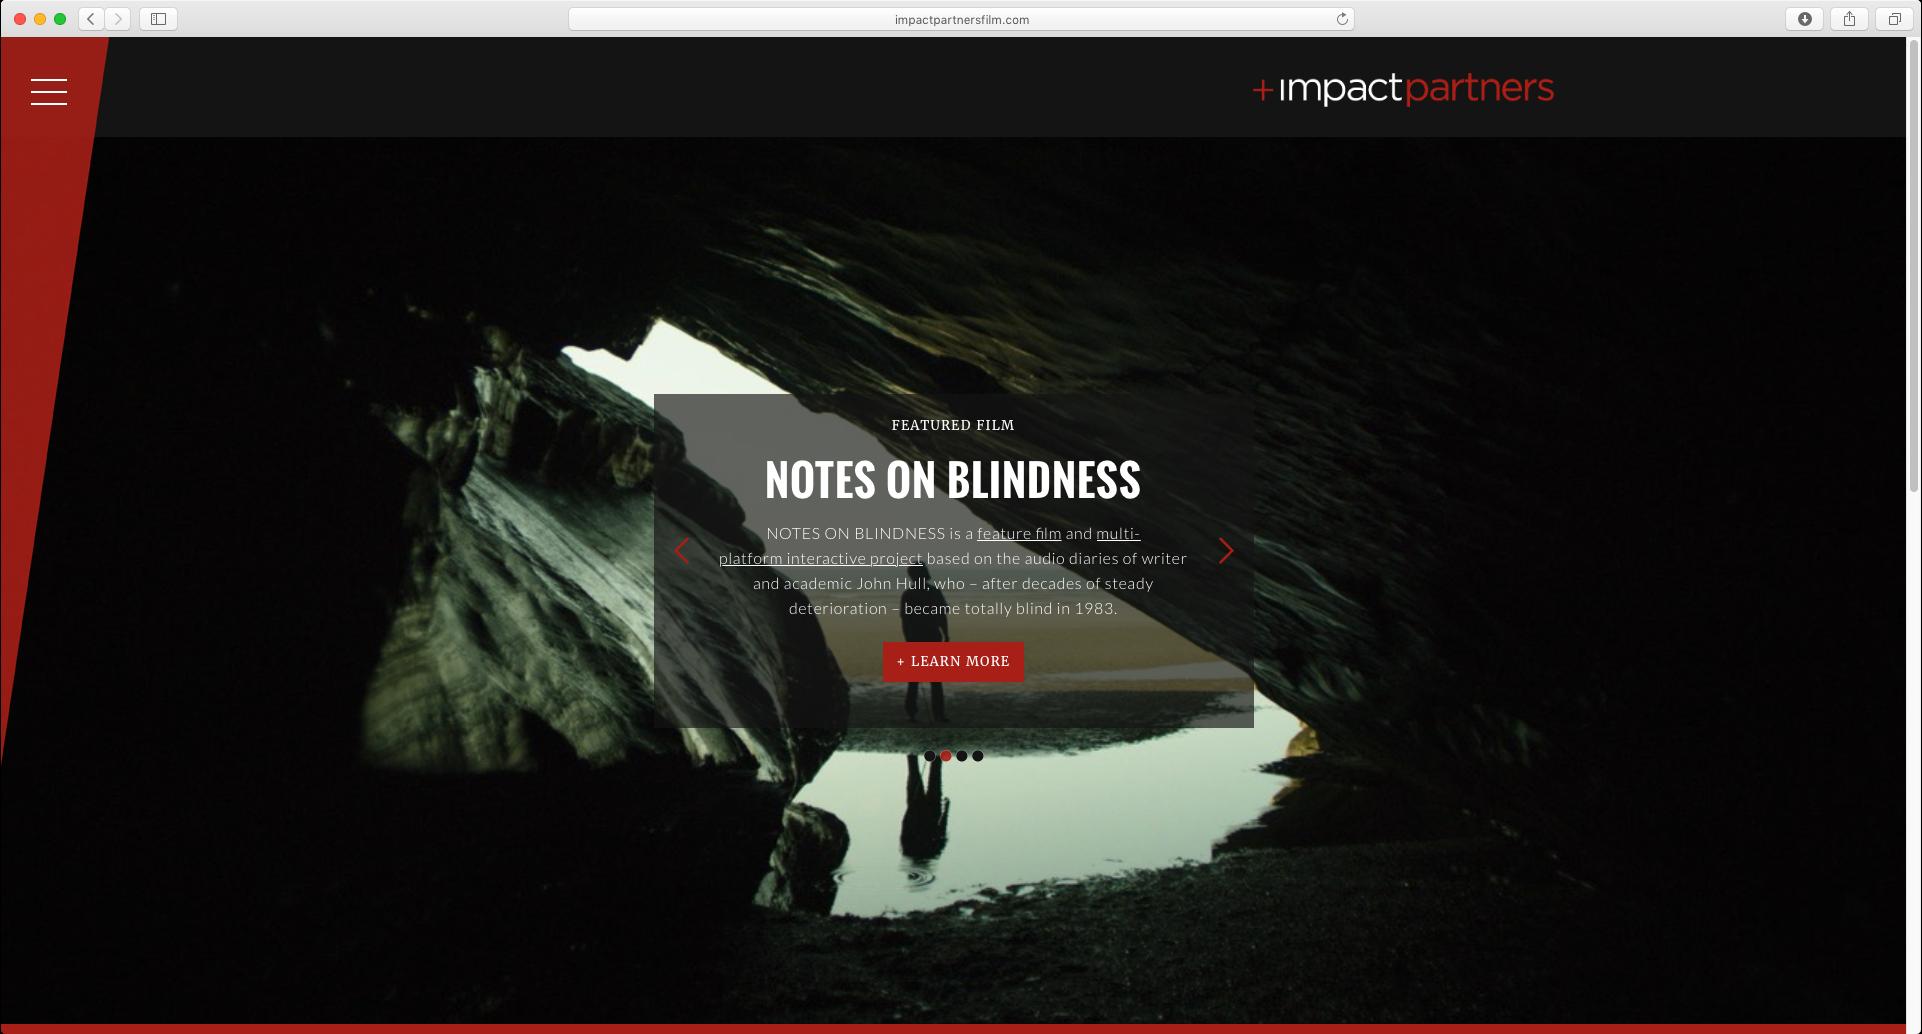 impactpartnersfilm.png